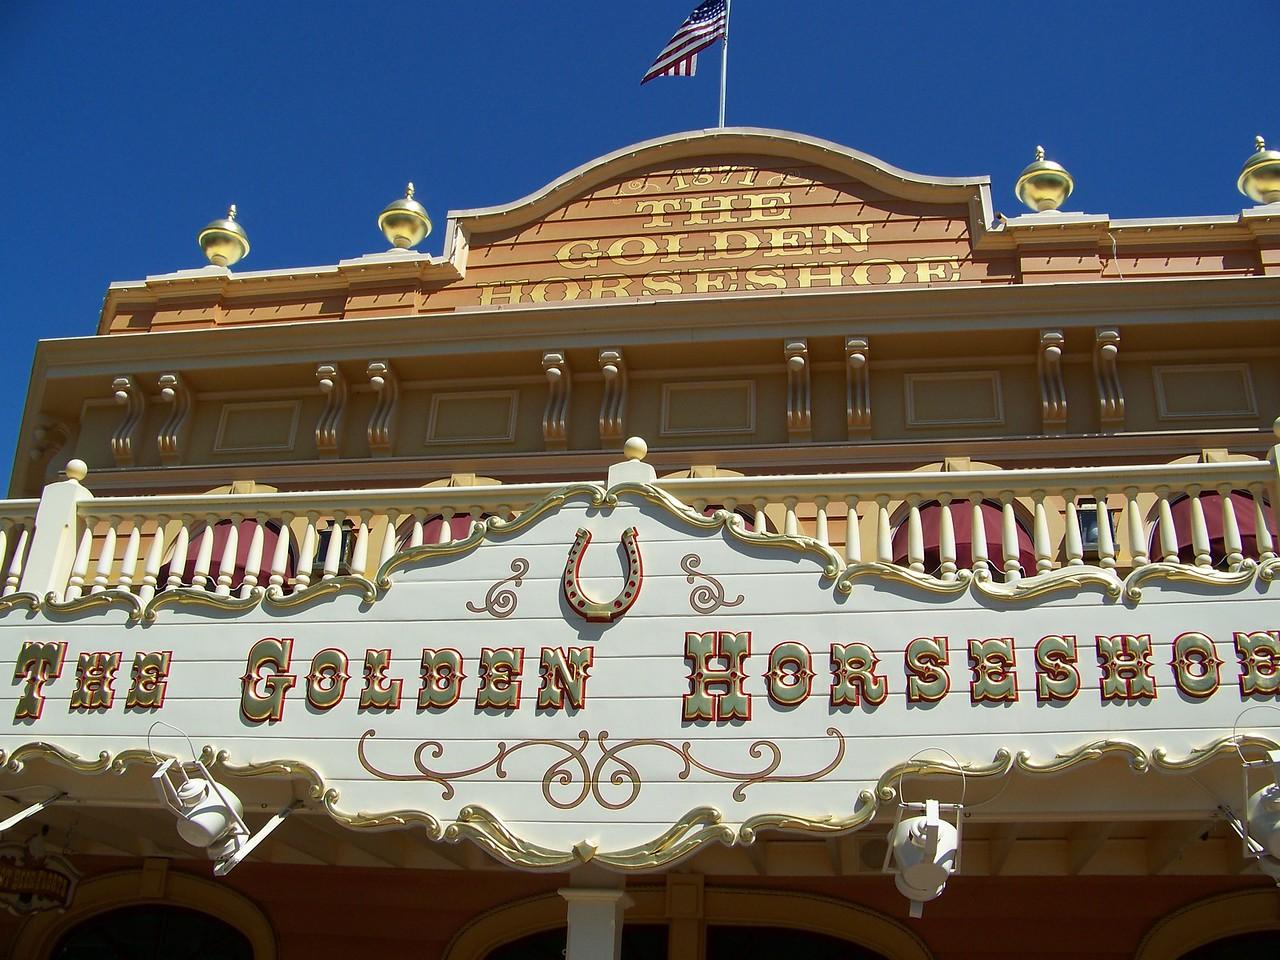 Disneyland - The Golden Horseshoe